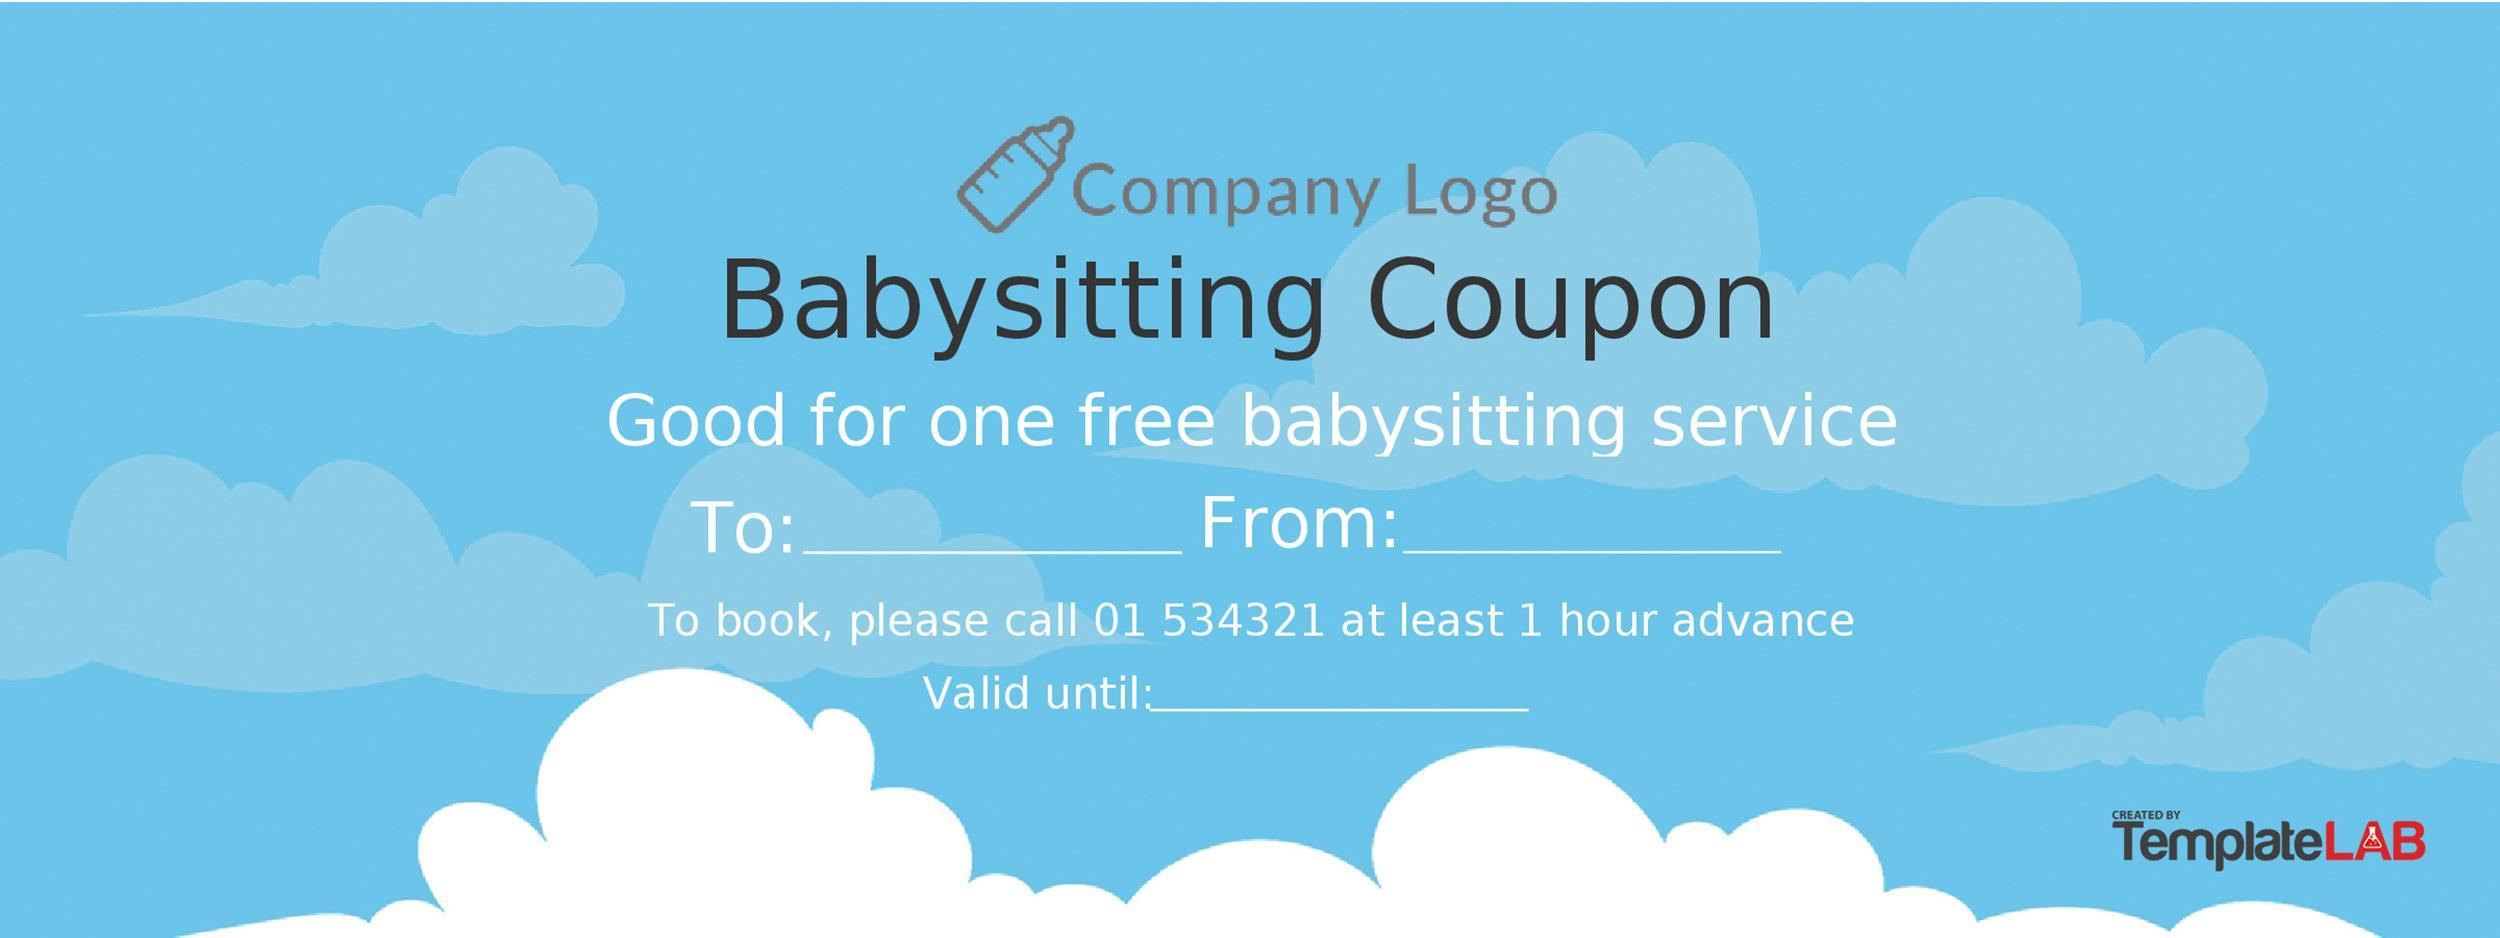 Babysitting Coupon 1 – TemplateLab Exclusive